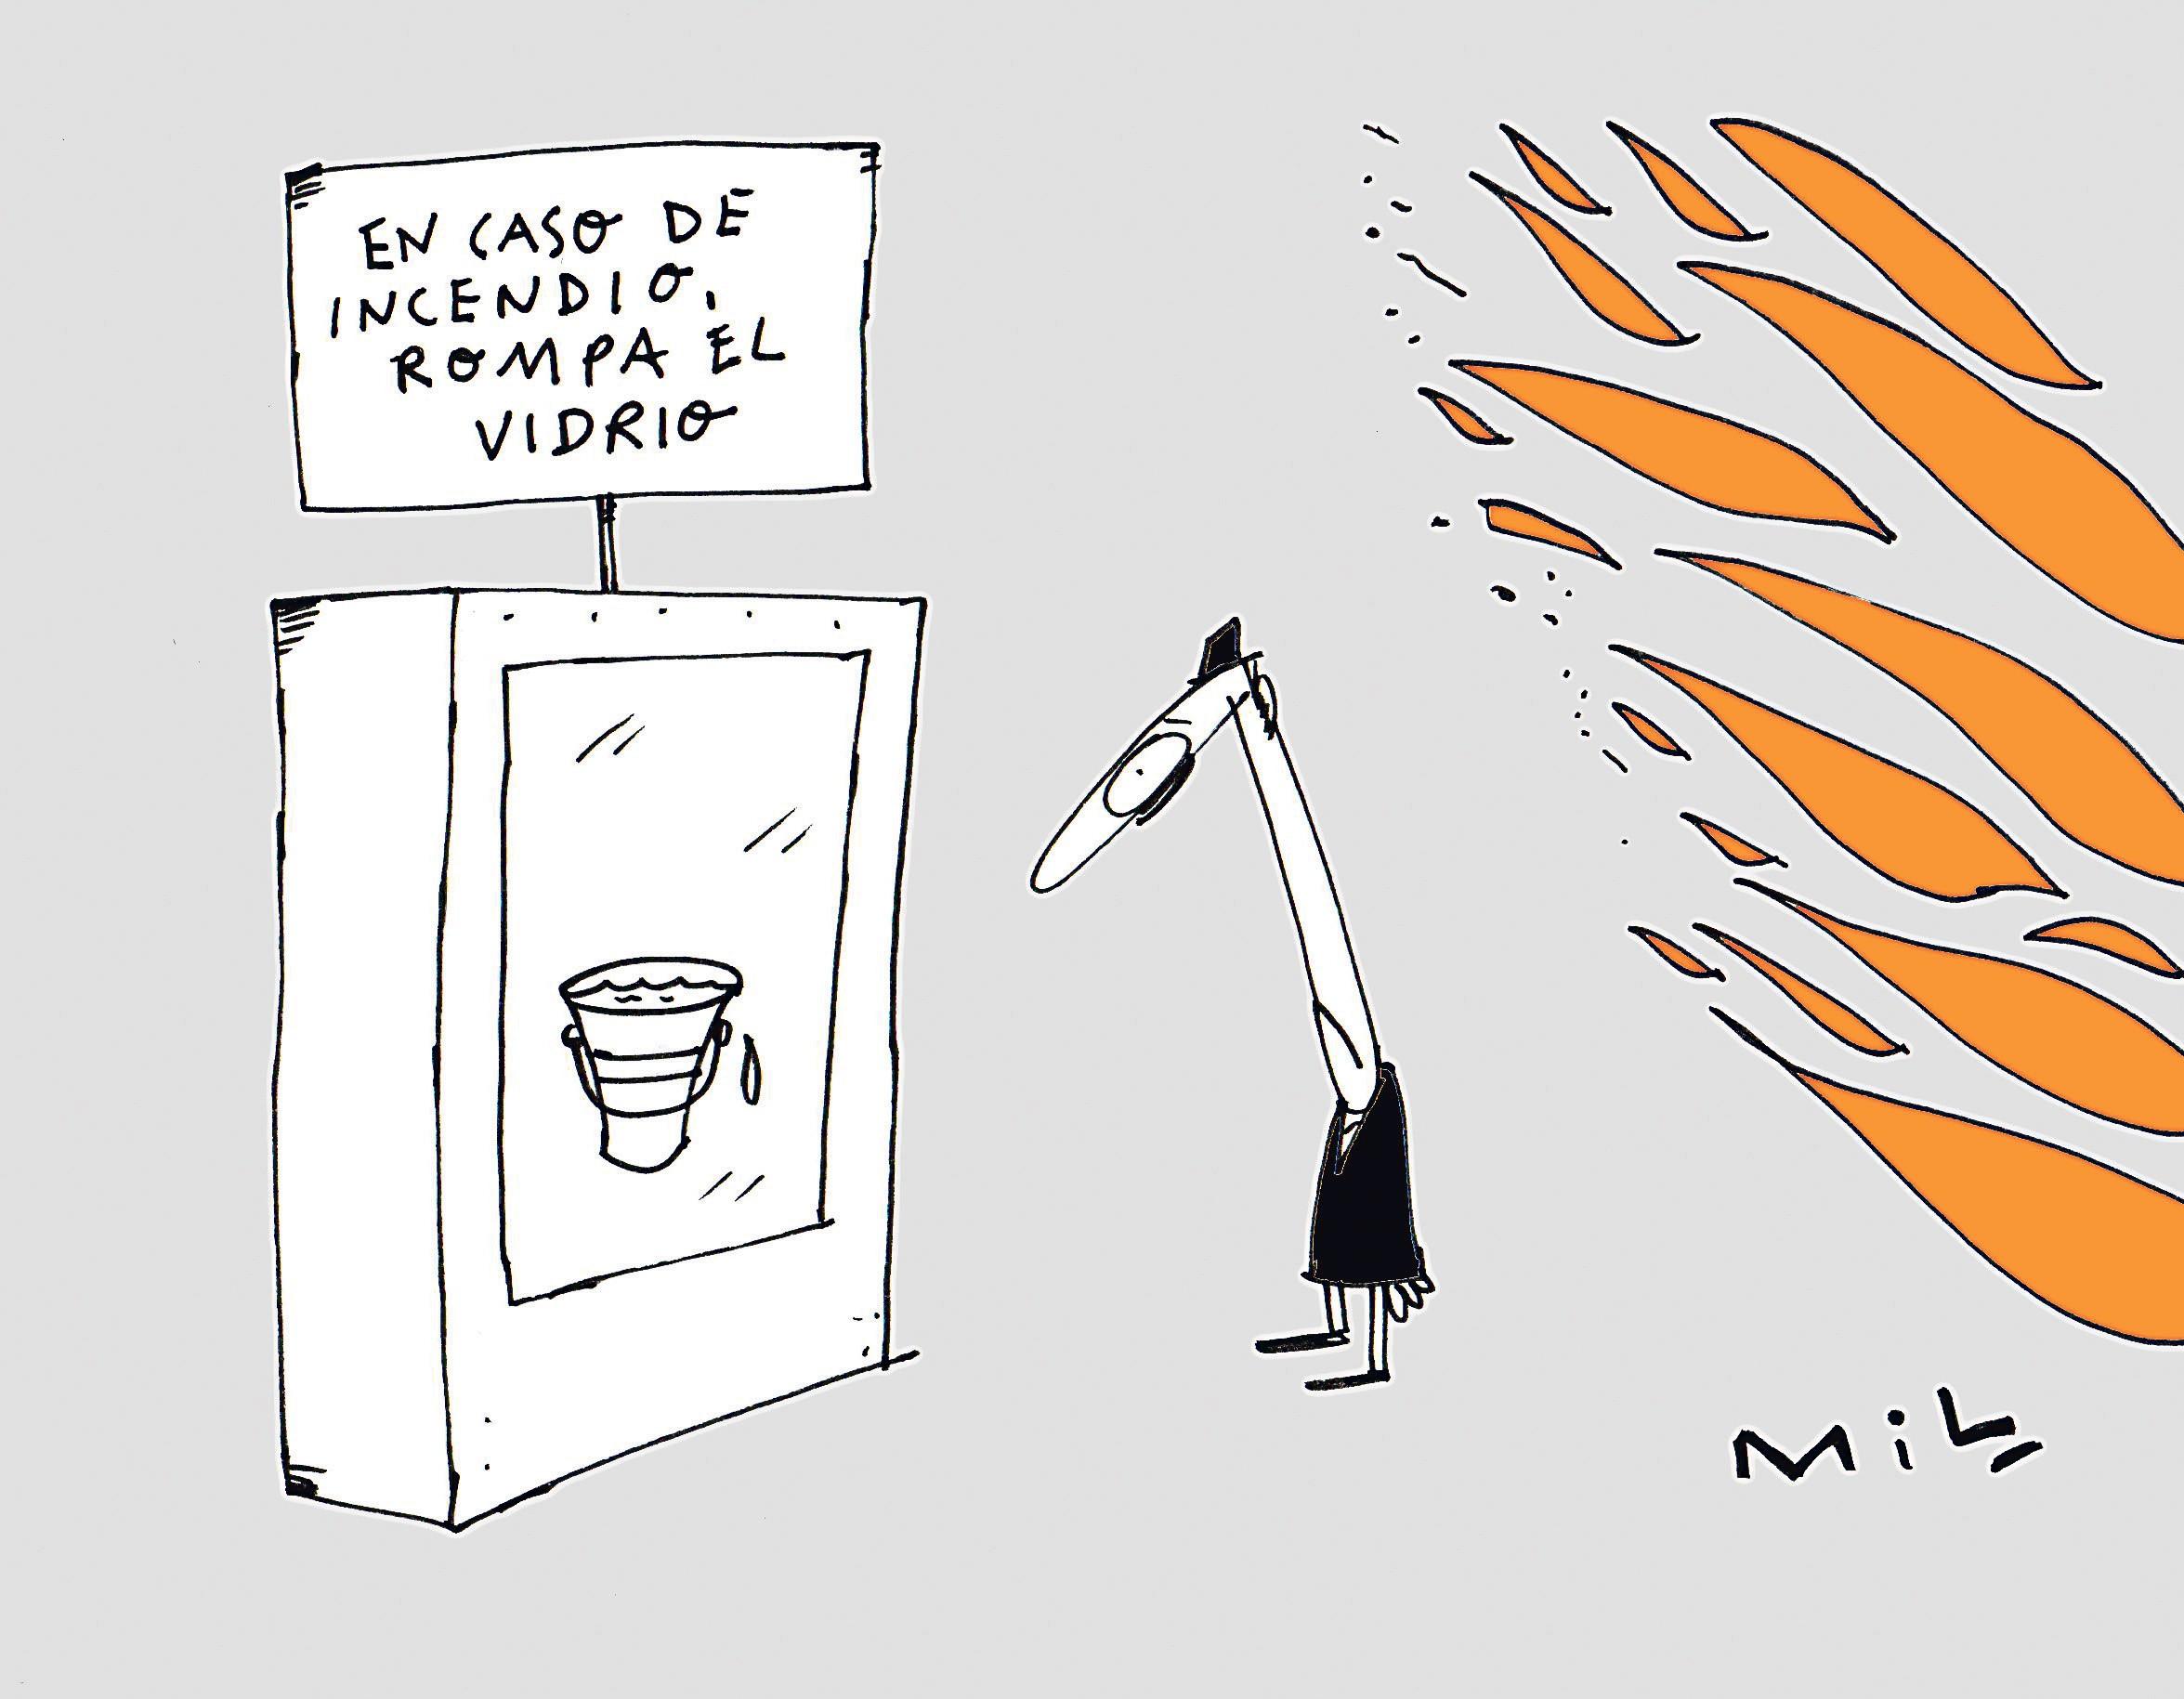 Caricatura 13 de Febrero de 2020